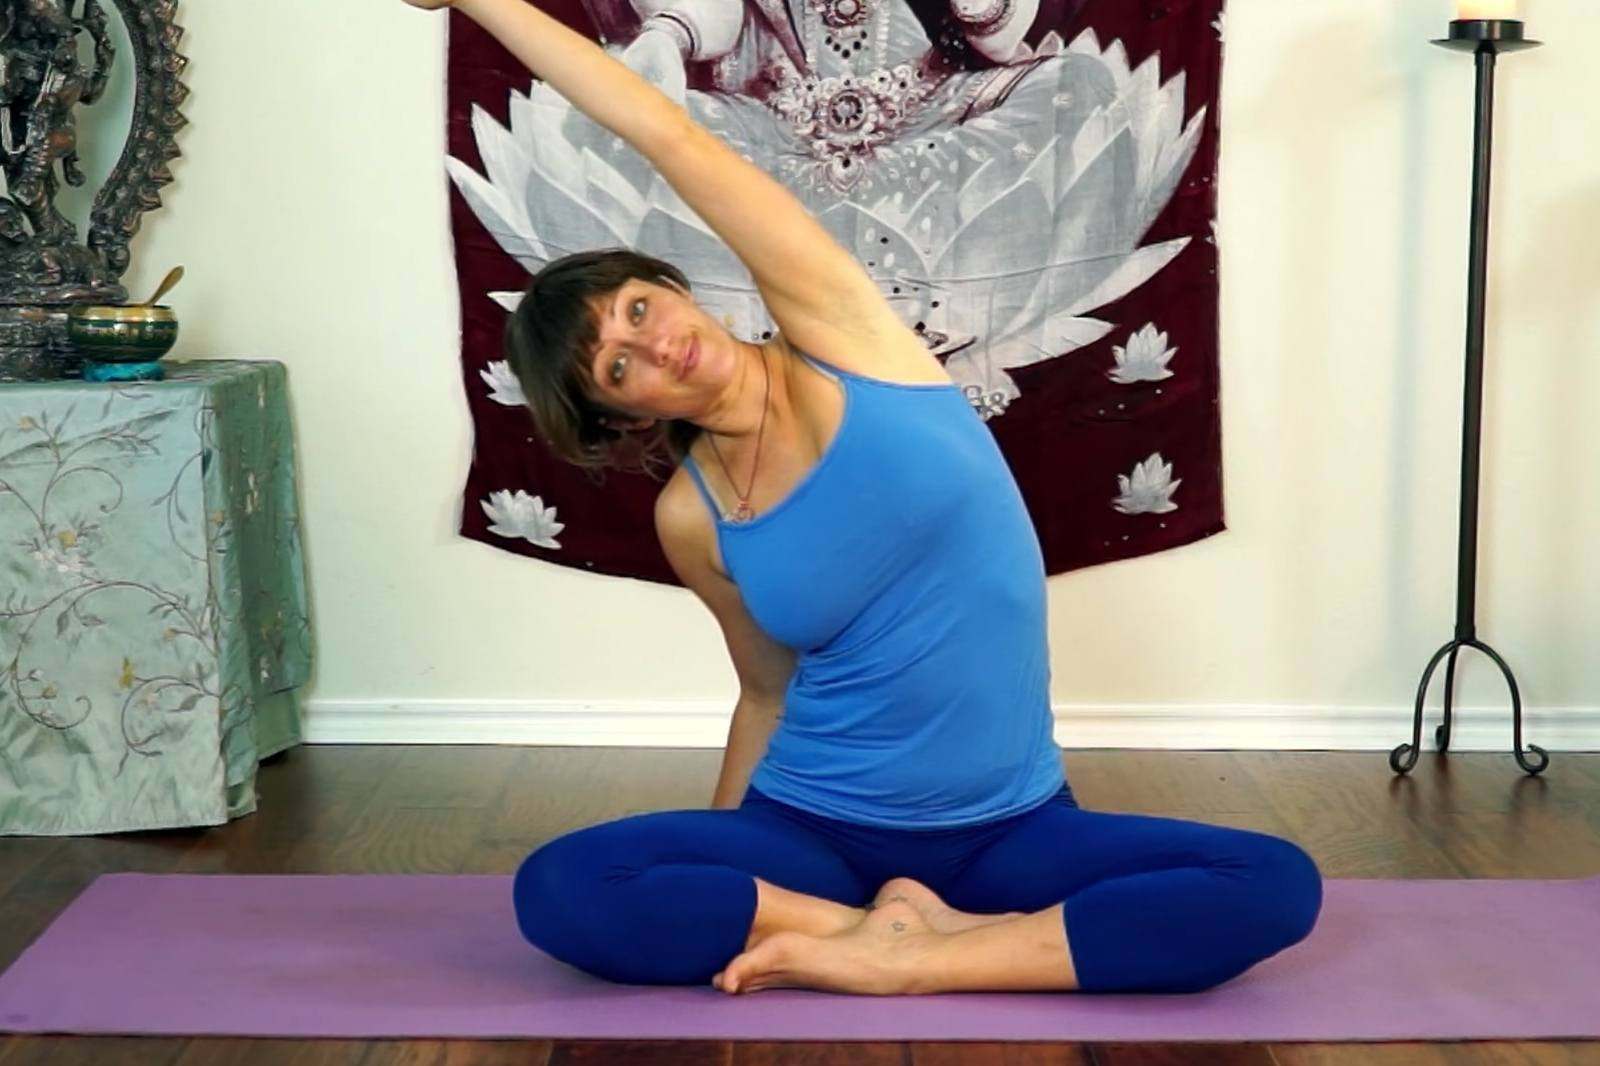 Beginners Yoga For Back Pain Neck Pain Sciatica Flexibility